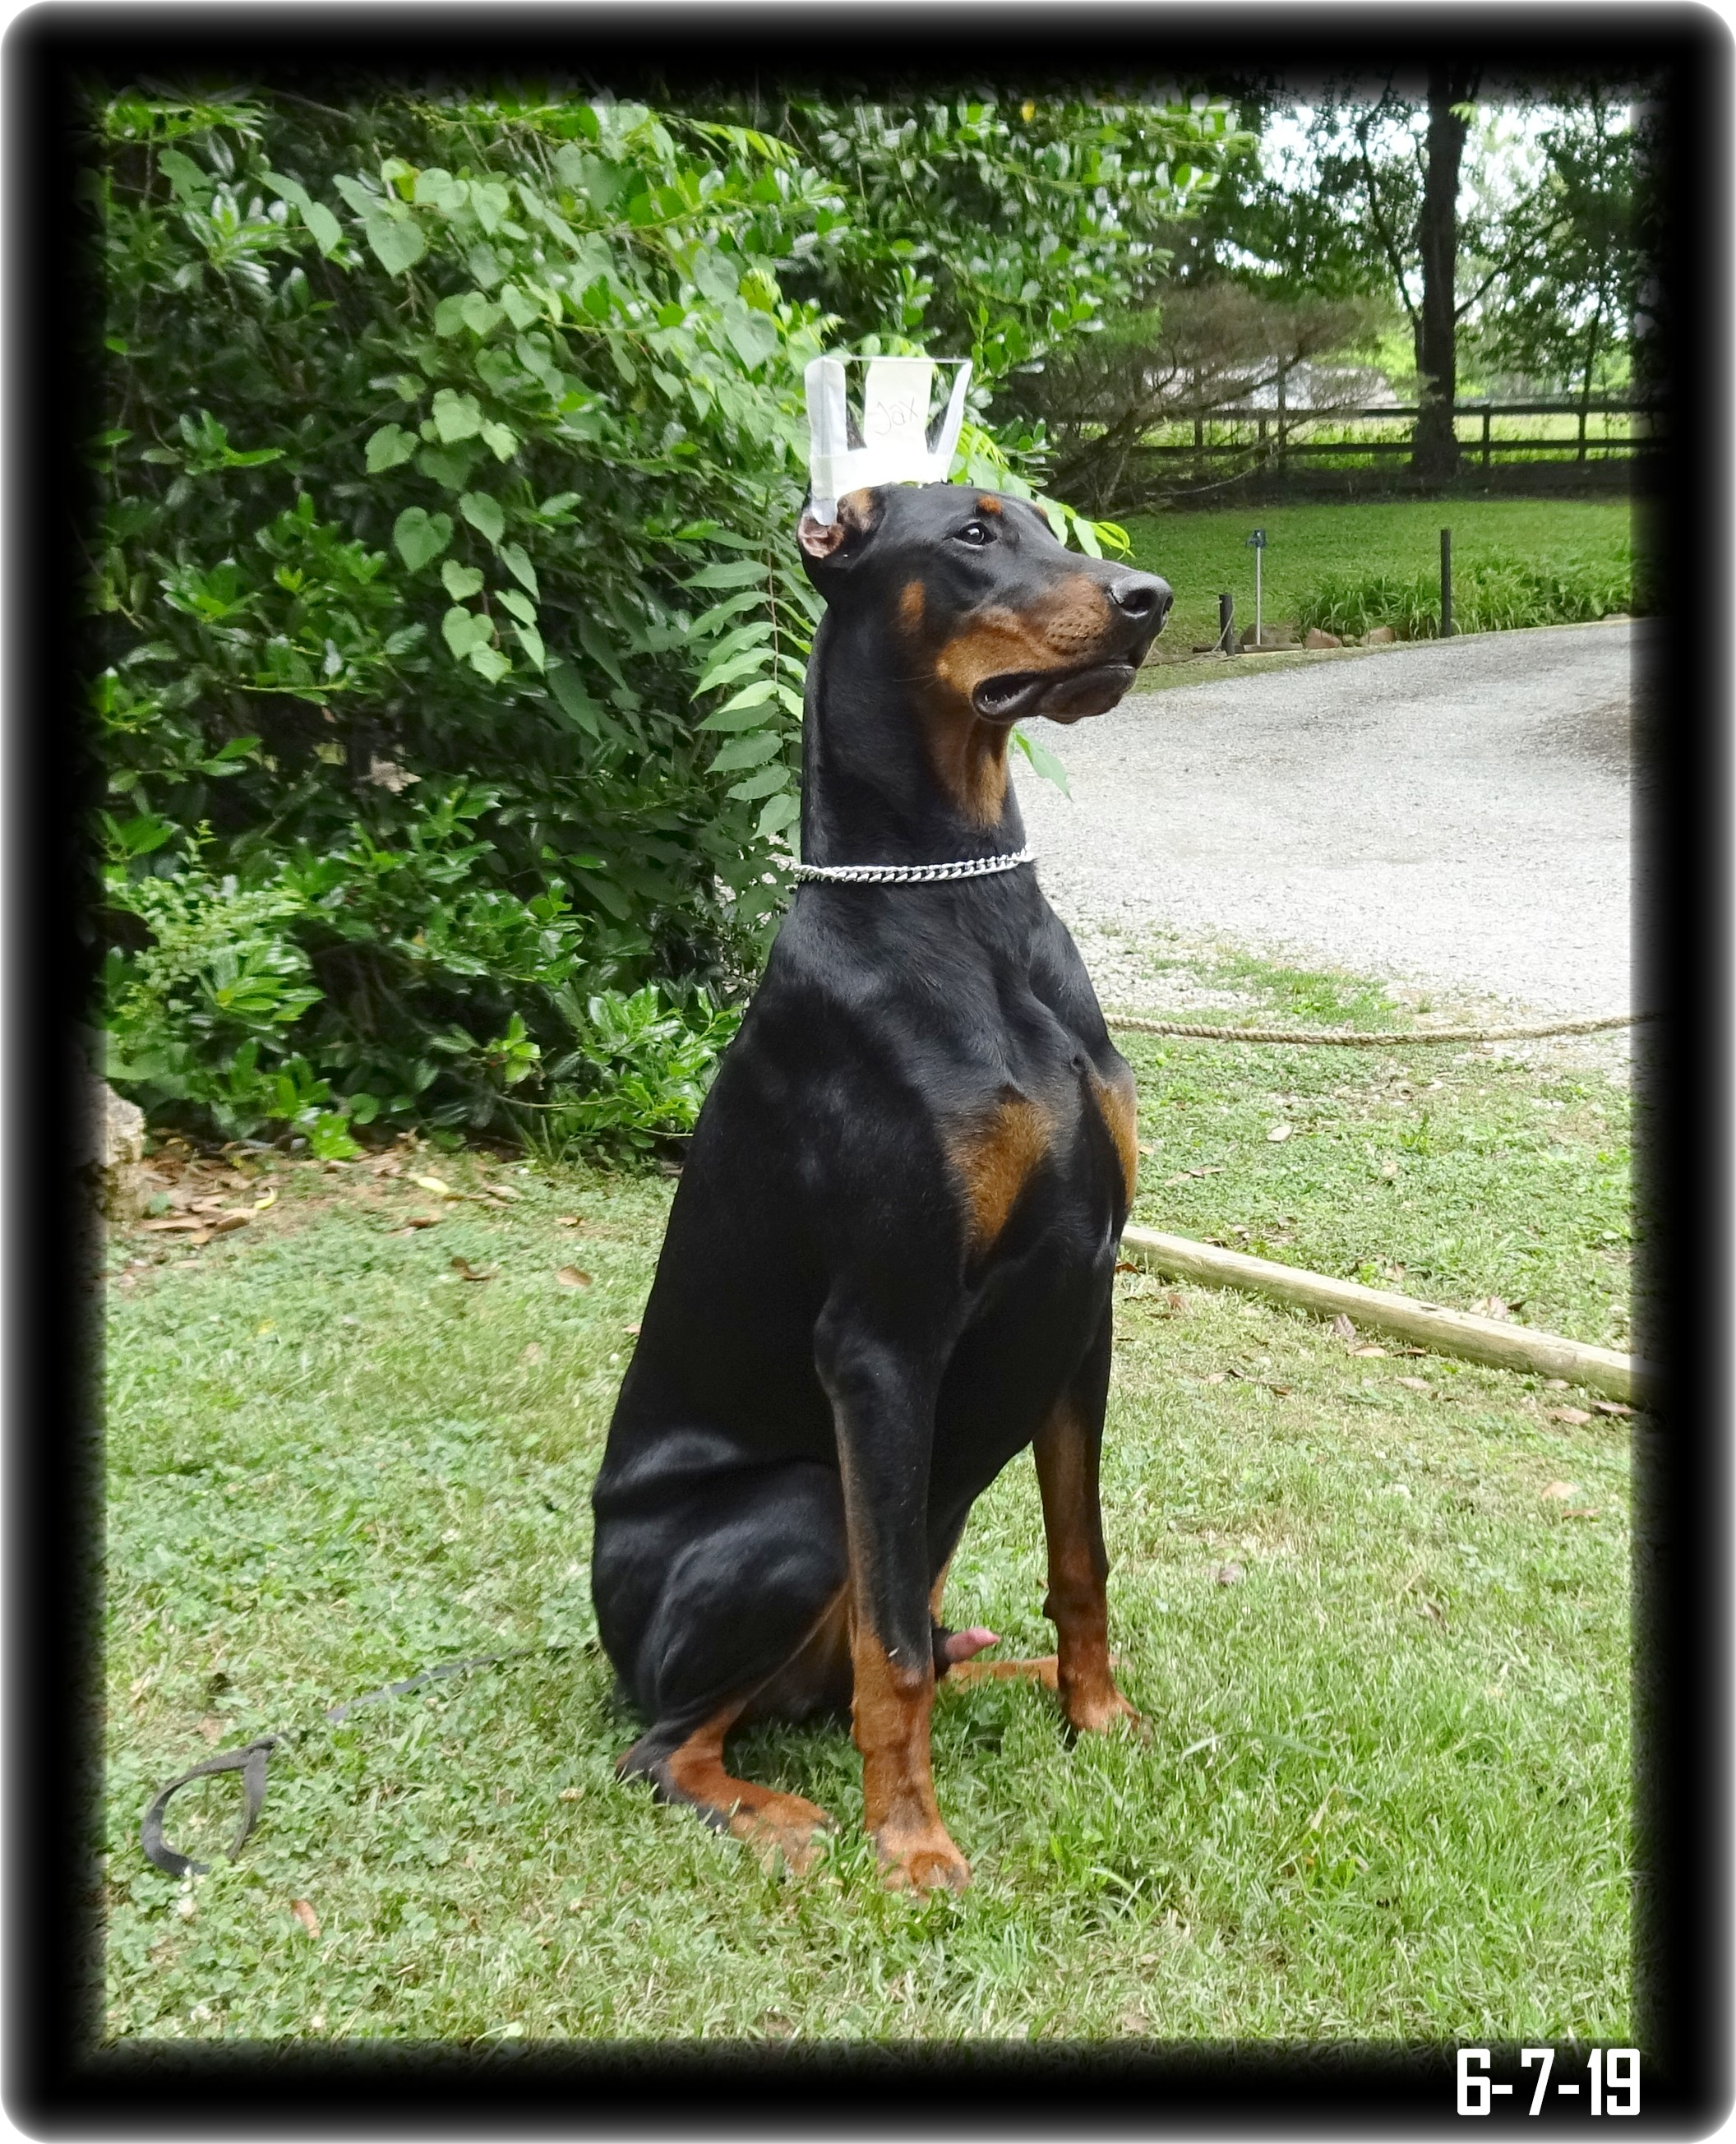 Jax was Gary a Zoey & max  pup  born 9-3-18 in training CYA Level 2 CGC